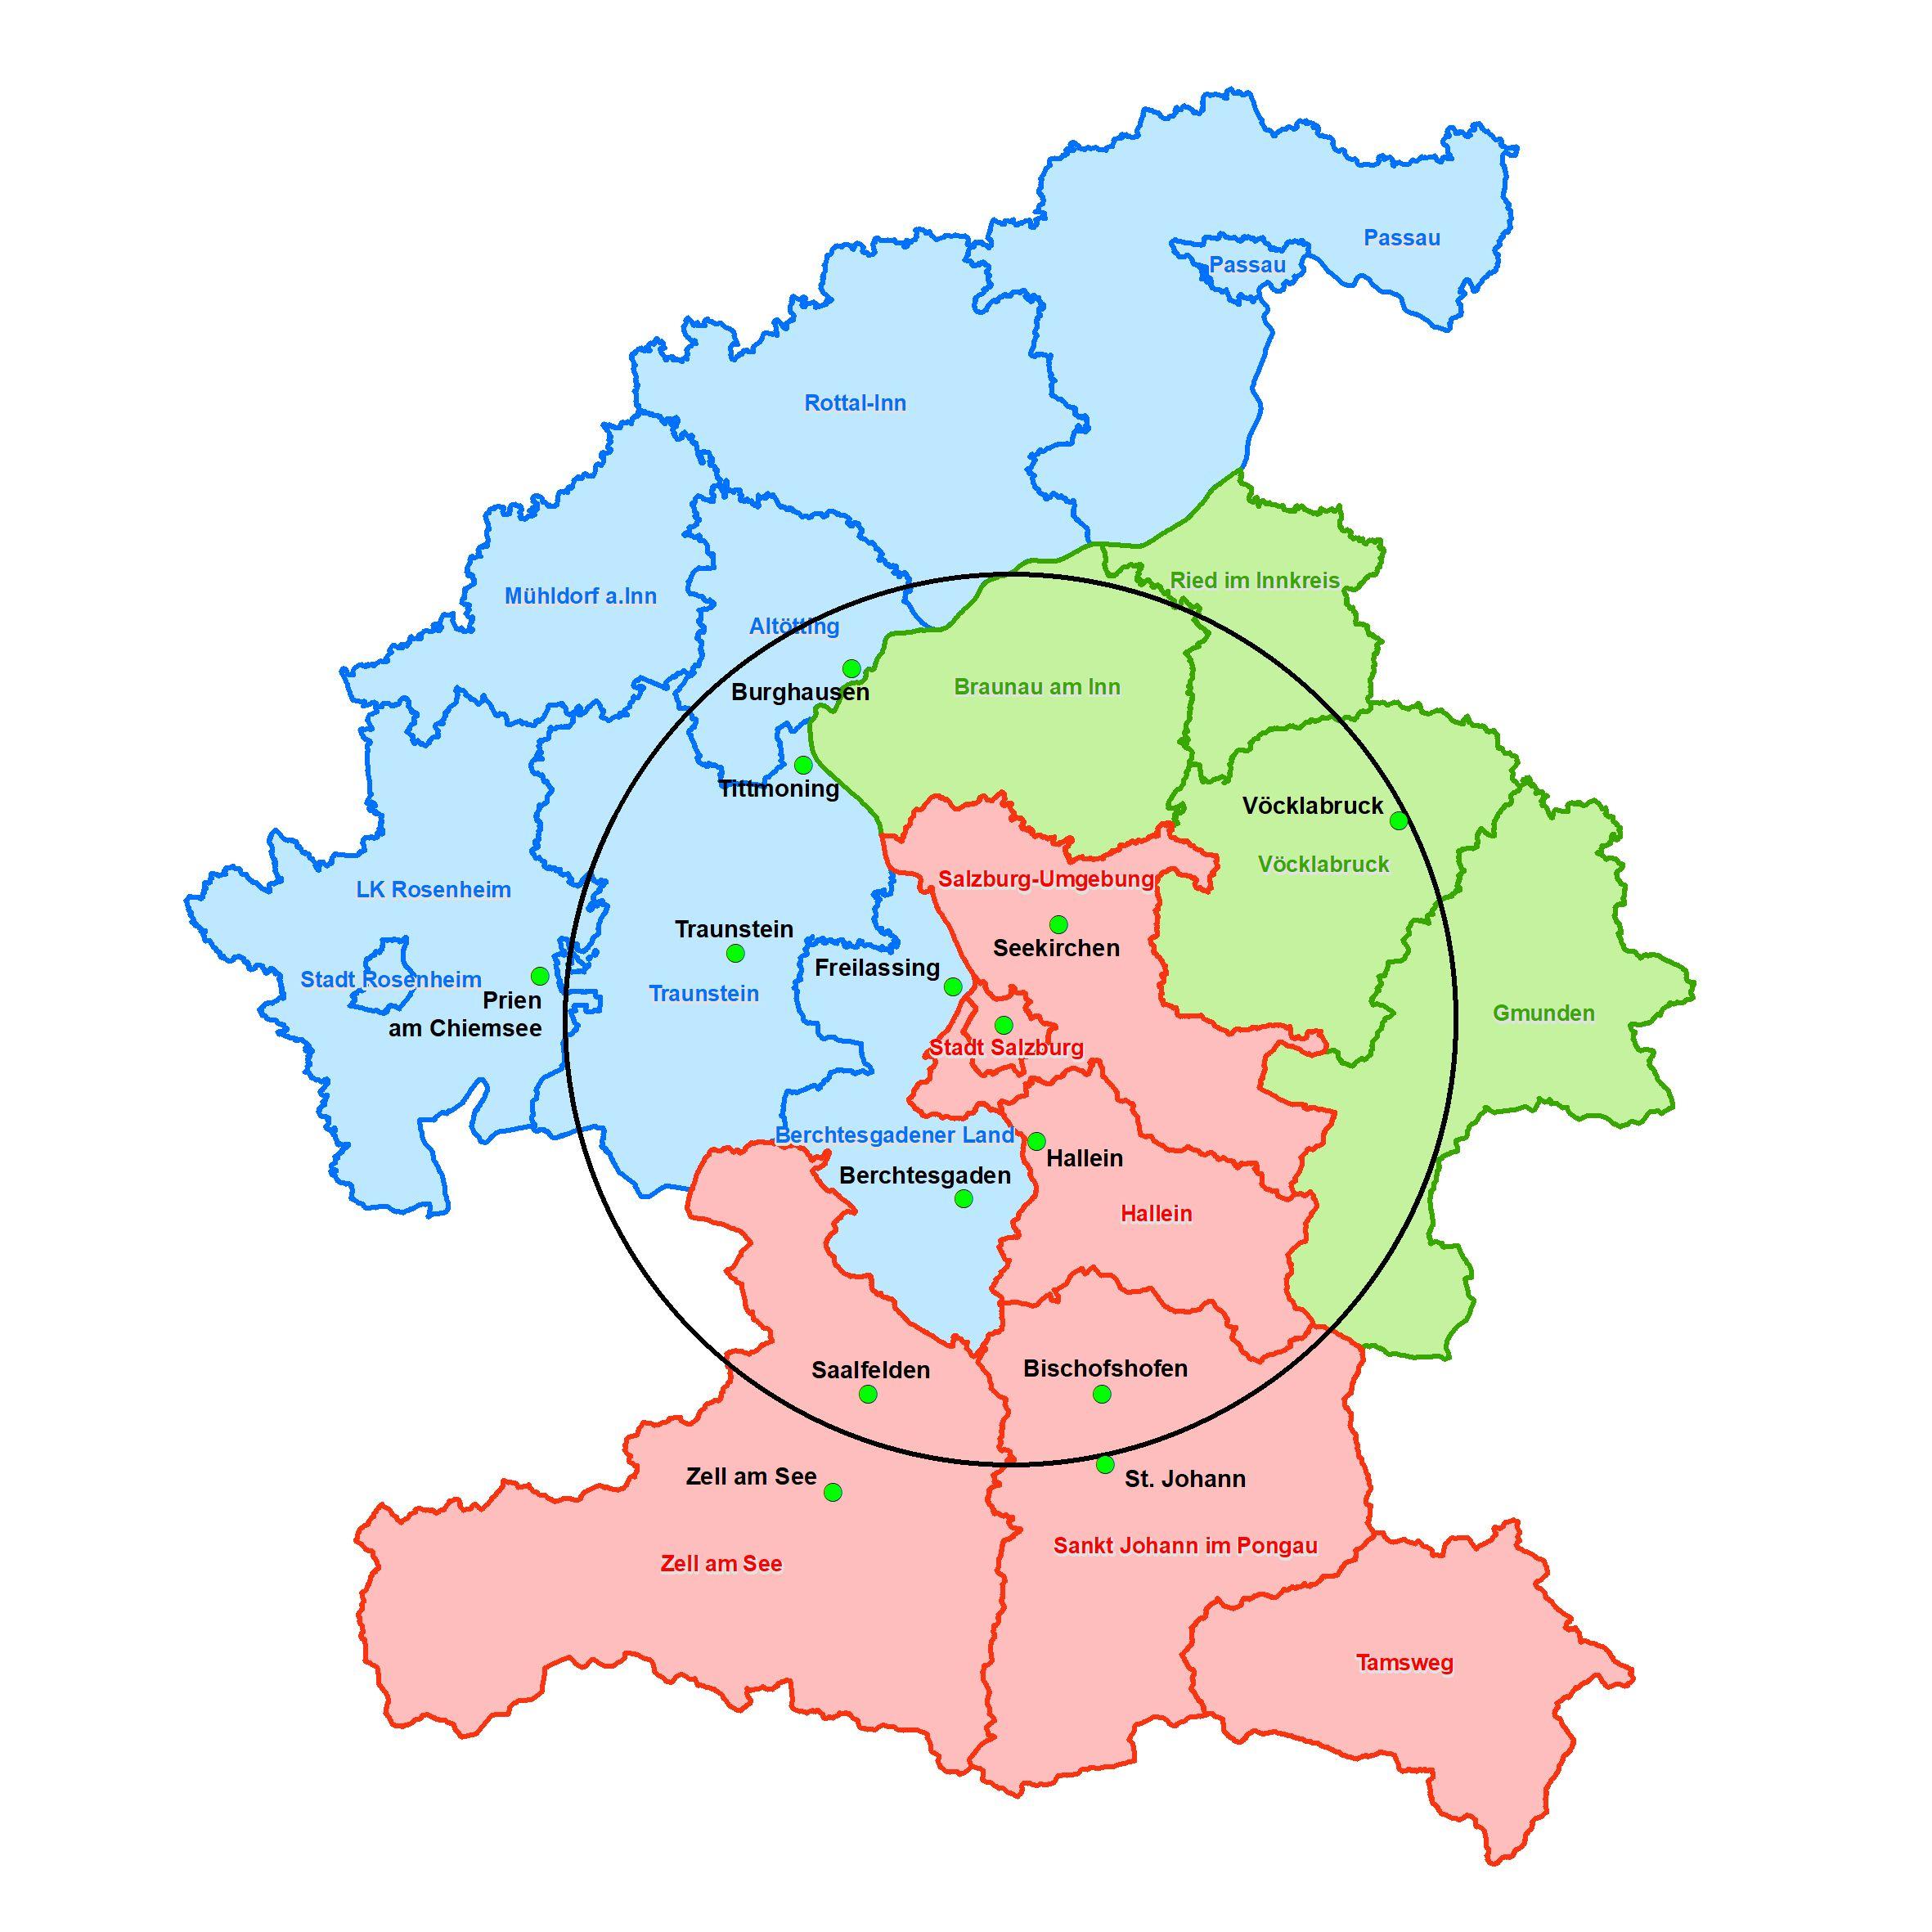 Regionalstadtbahn - Karte EUREGIO-Rat Quelle: SAGIS und Salzburger Regionalstadtbahn